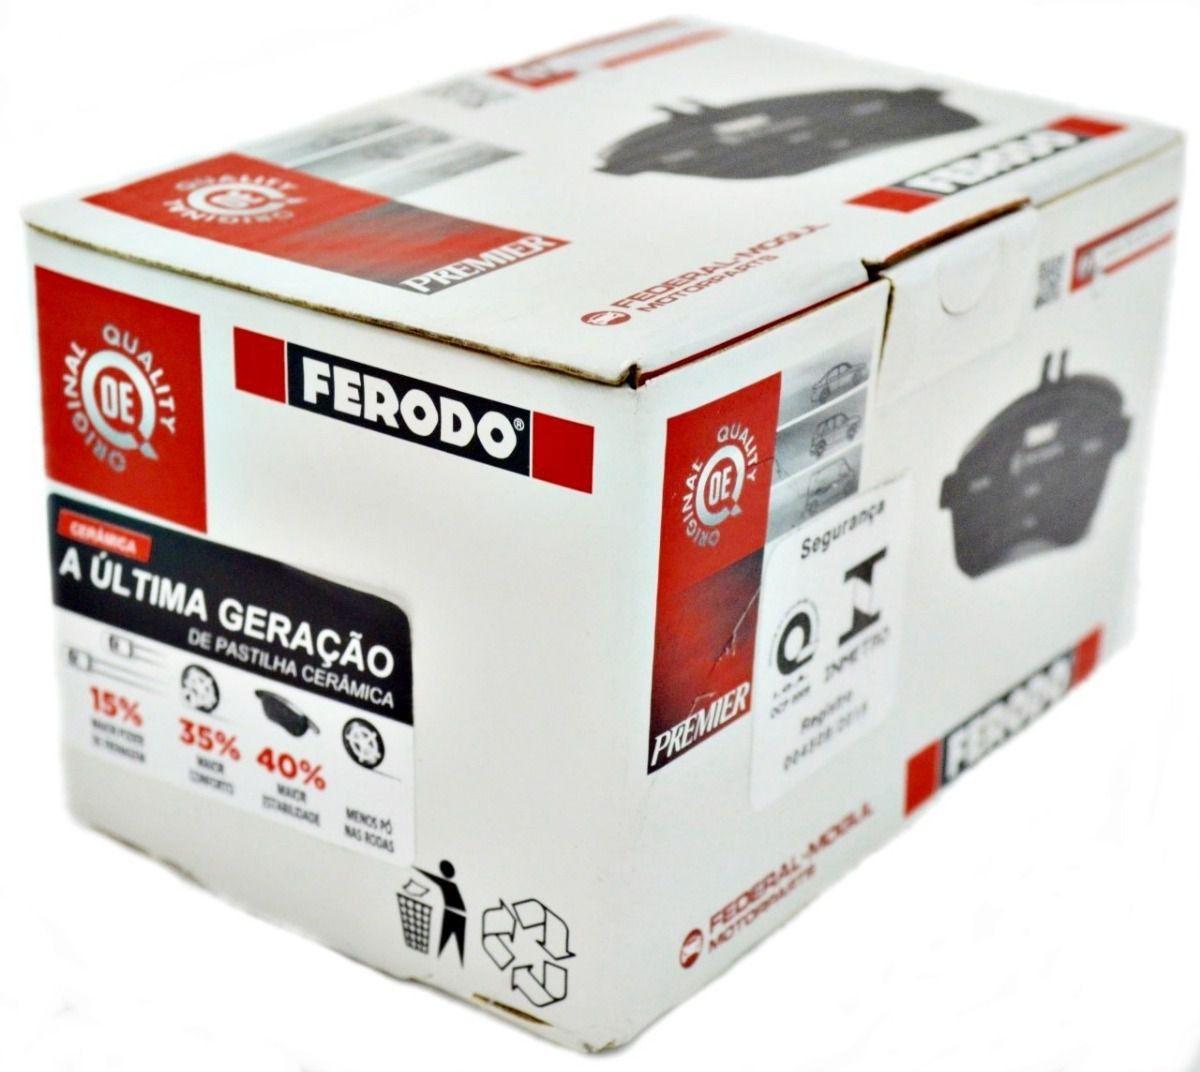 Pastilha Freio Dianteiro Ceramica Ferodo Fox CrossFox Polo Golf Saveiro Audi A3 Golf Bora New Beetle   - Unicar